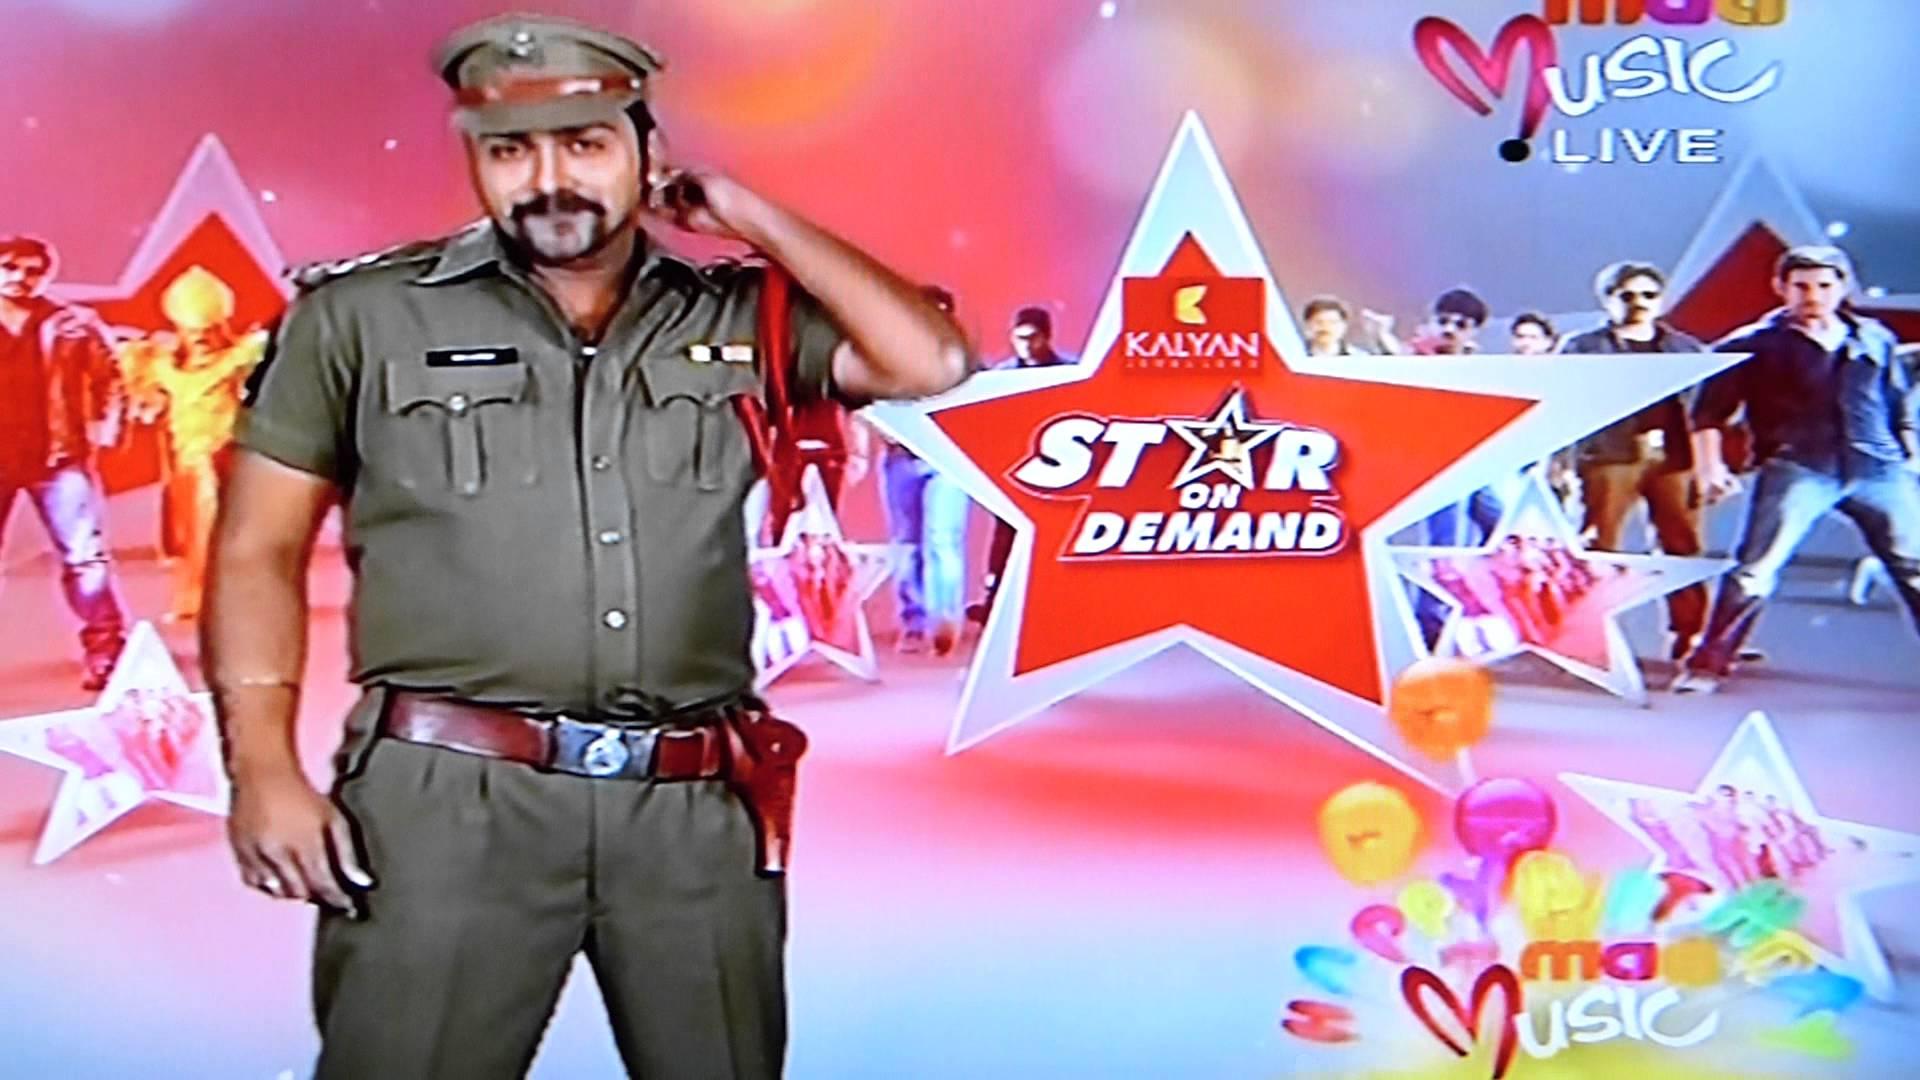 Star On Demand